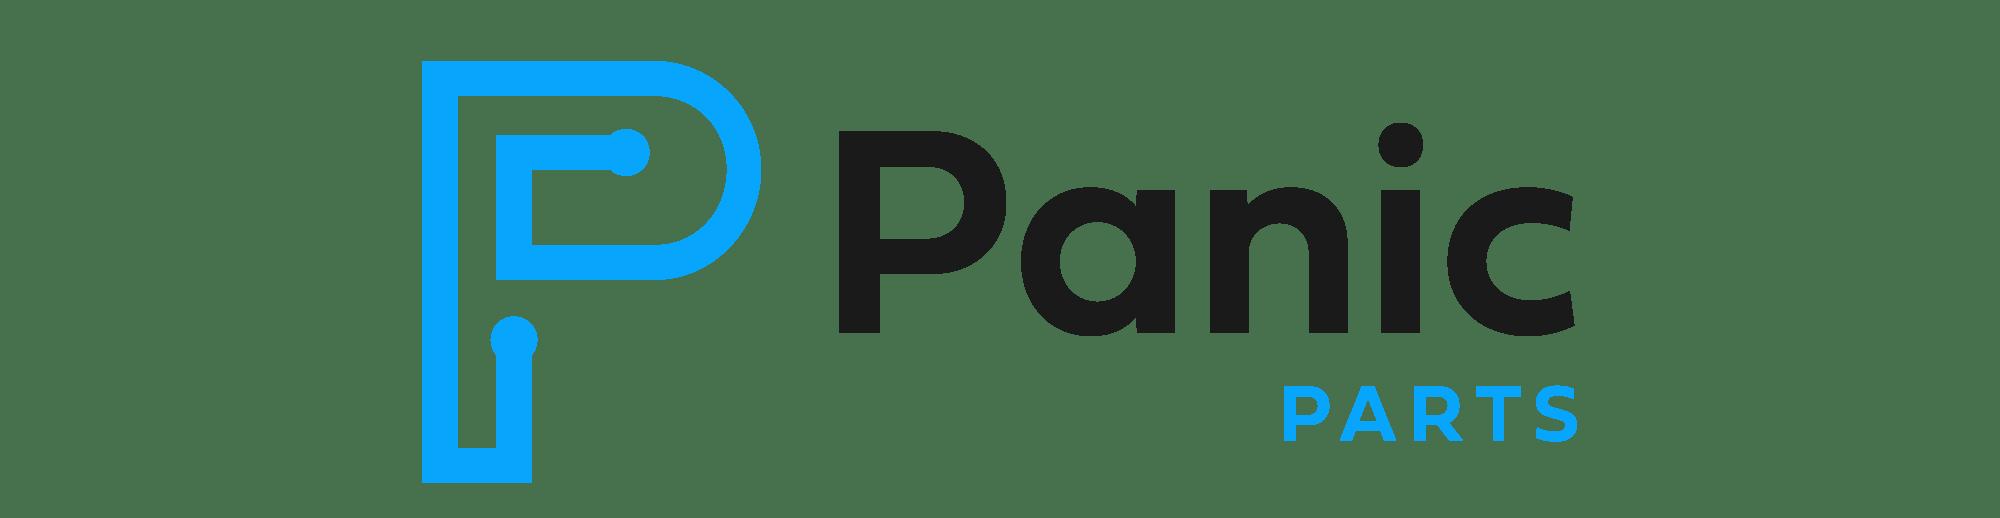 PanicParts.com